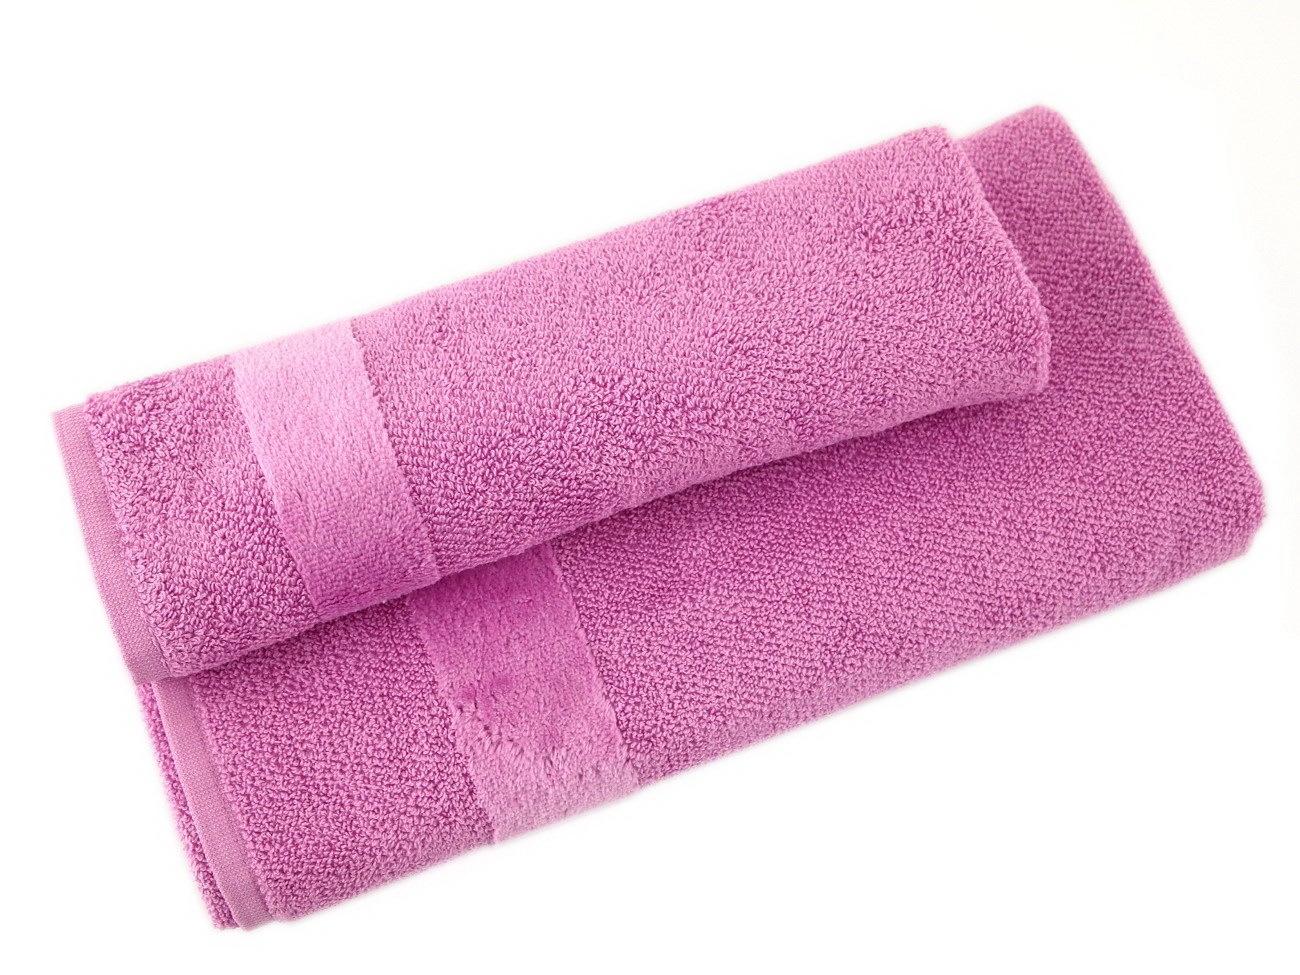 Наборы полотенец Набор полотенец 2 шт Carrara Fyber розовый elitnye-polotentsa-mahrovye-fyber-633-rozovye-ot-carrara-italiya.JPG